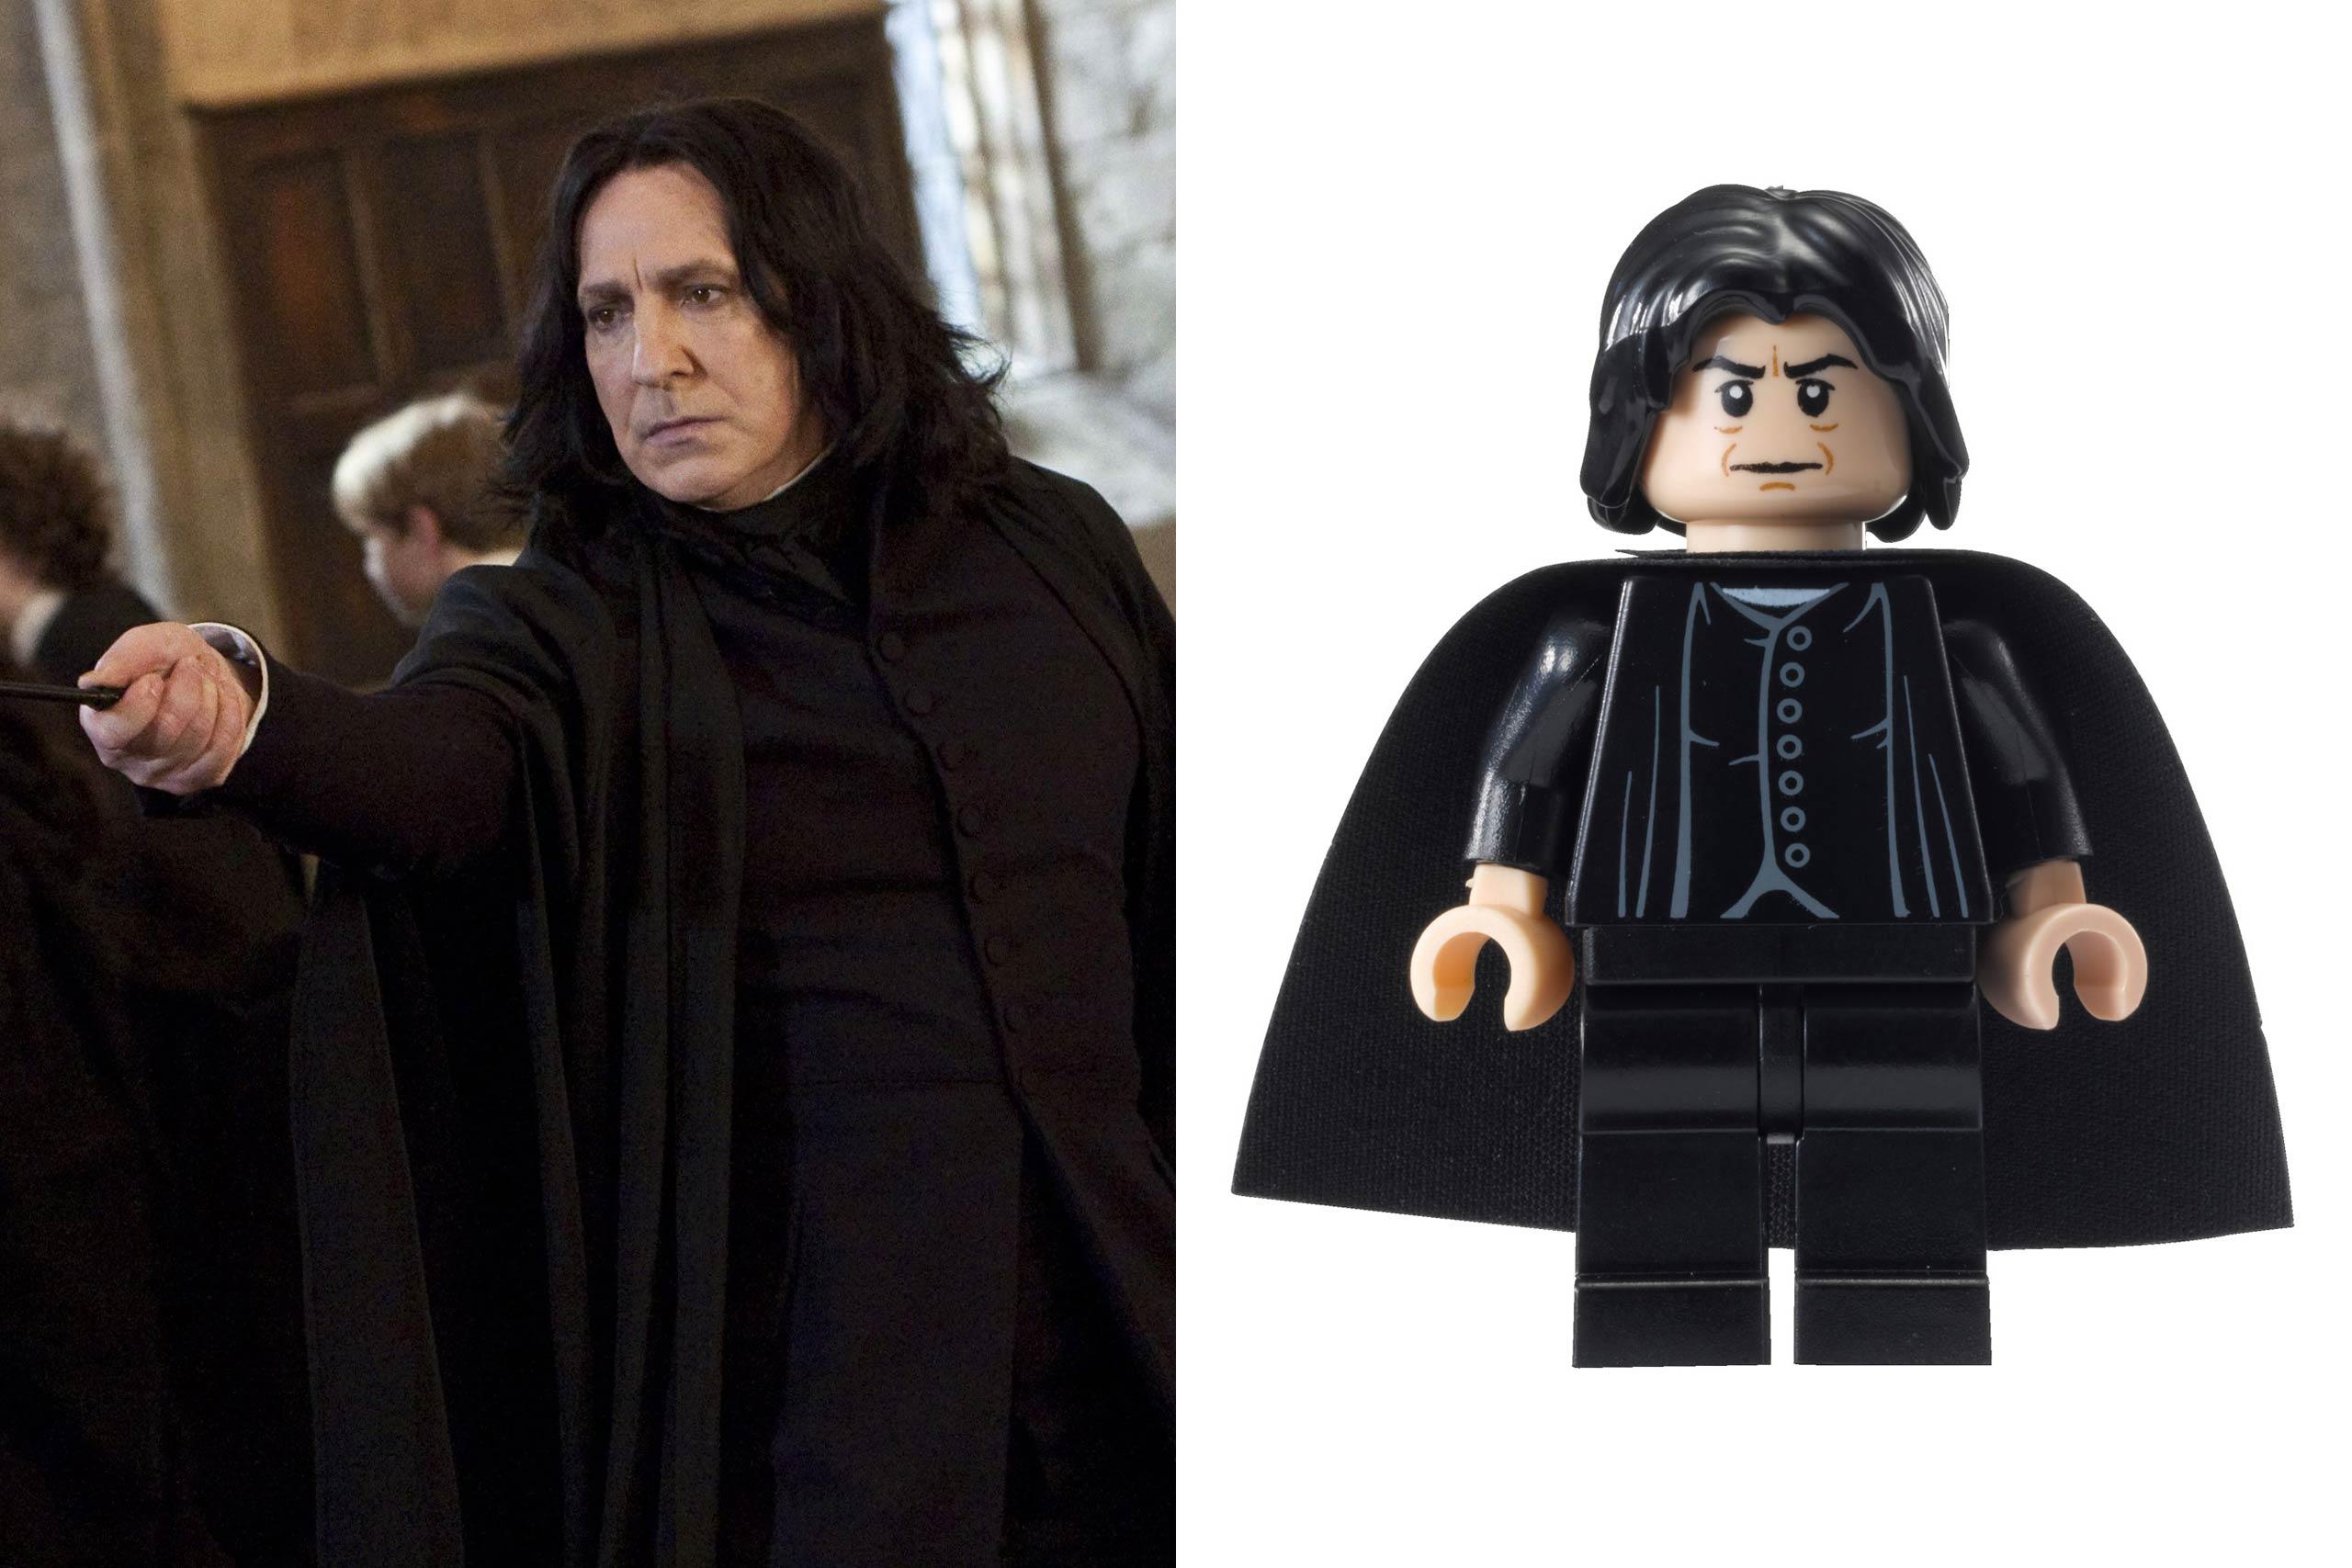 <strong>Alan Rickman: Professor Snape</strong>